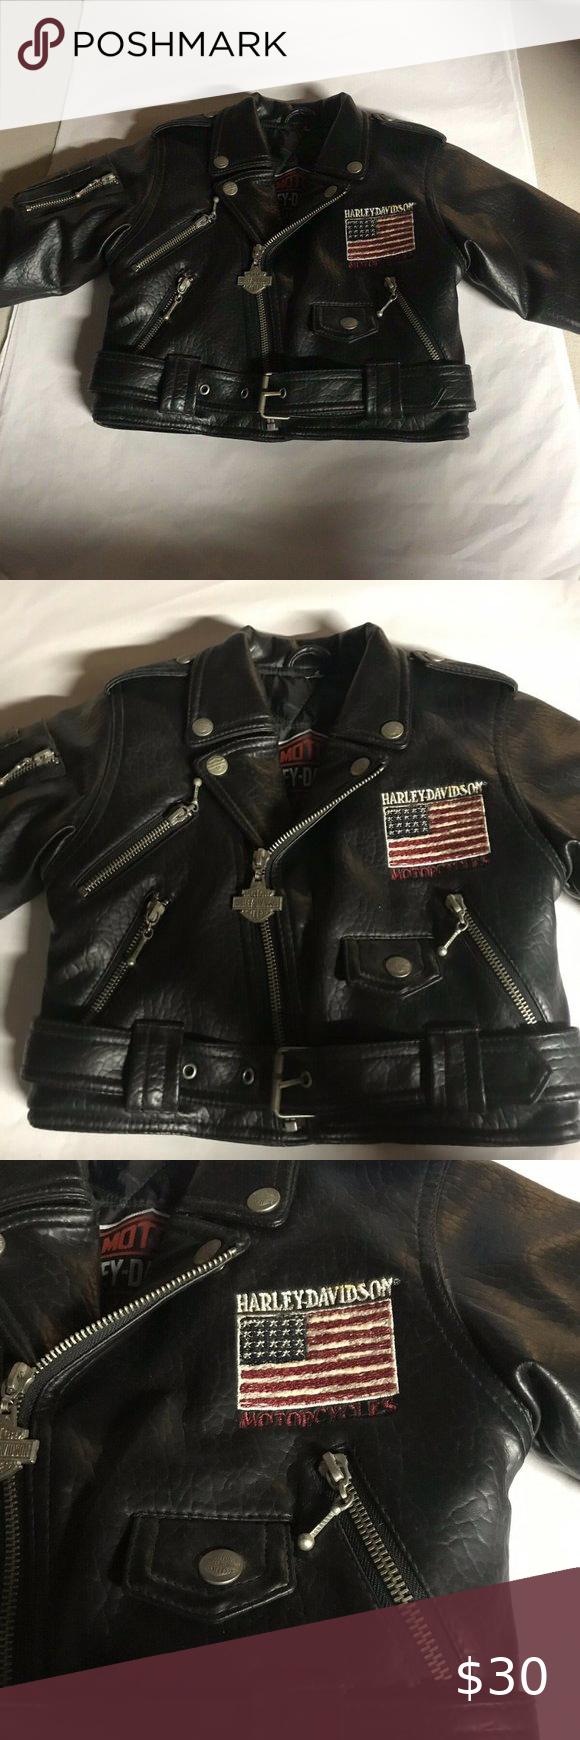 Harley Davidson Toddler Faux Leather Jacket 3t Toddler Faux Leather Jacket Leather Jacket Faux Leather Jackets [ 1740 x 580 Pixel ]